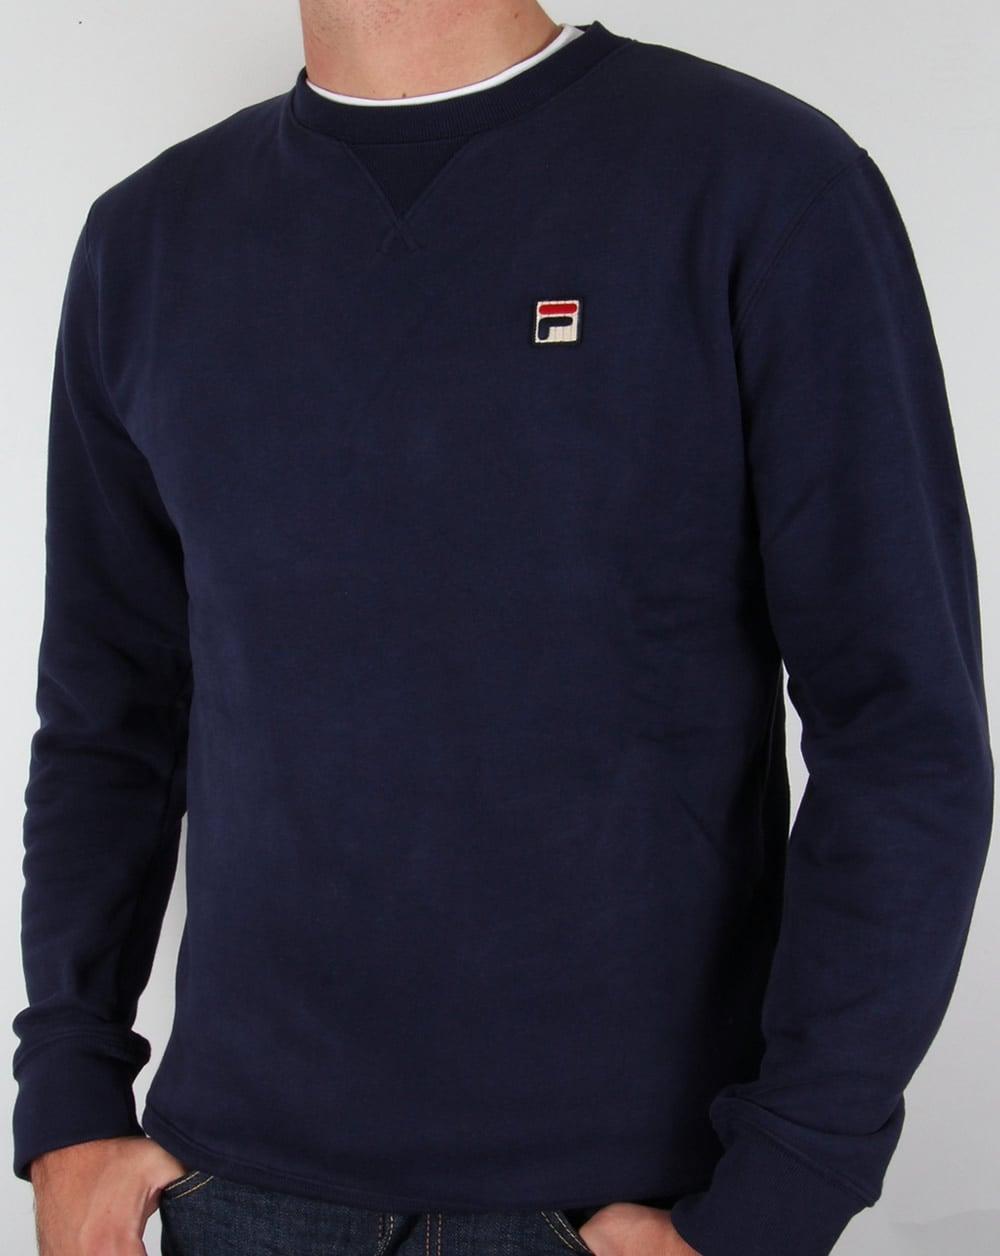 43d43597c8418 Fila Vintage Brixen Sweatshirt Navy,crew neck,round,sweat,mens